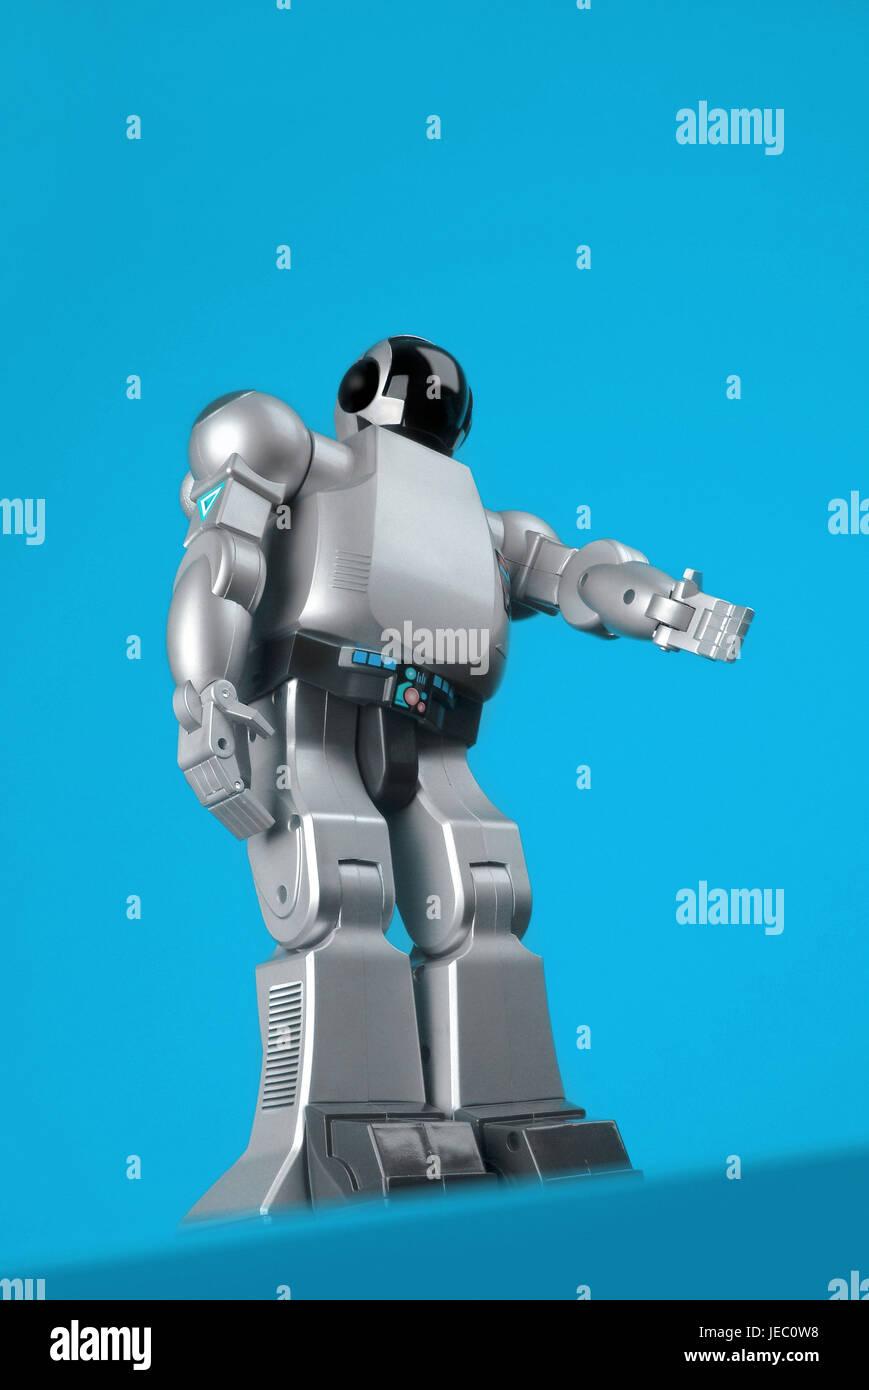 Bot passes the hand, - Stock Image